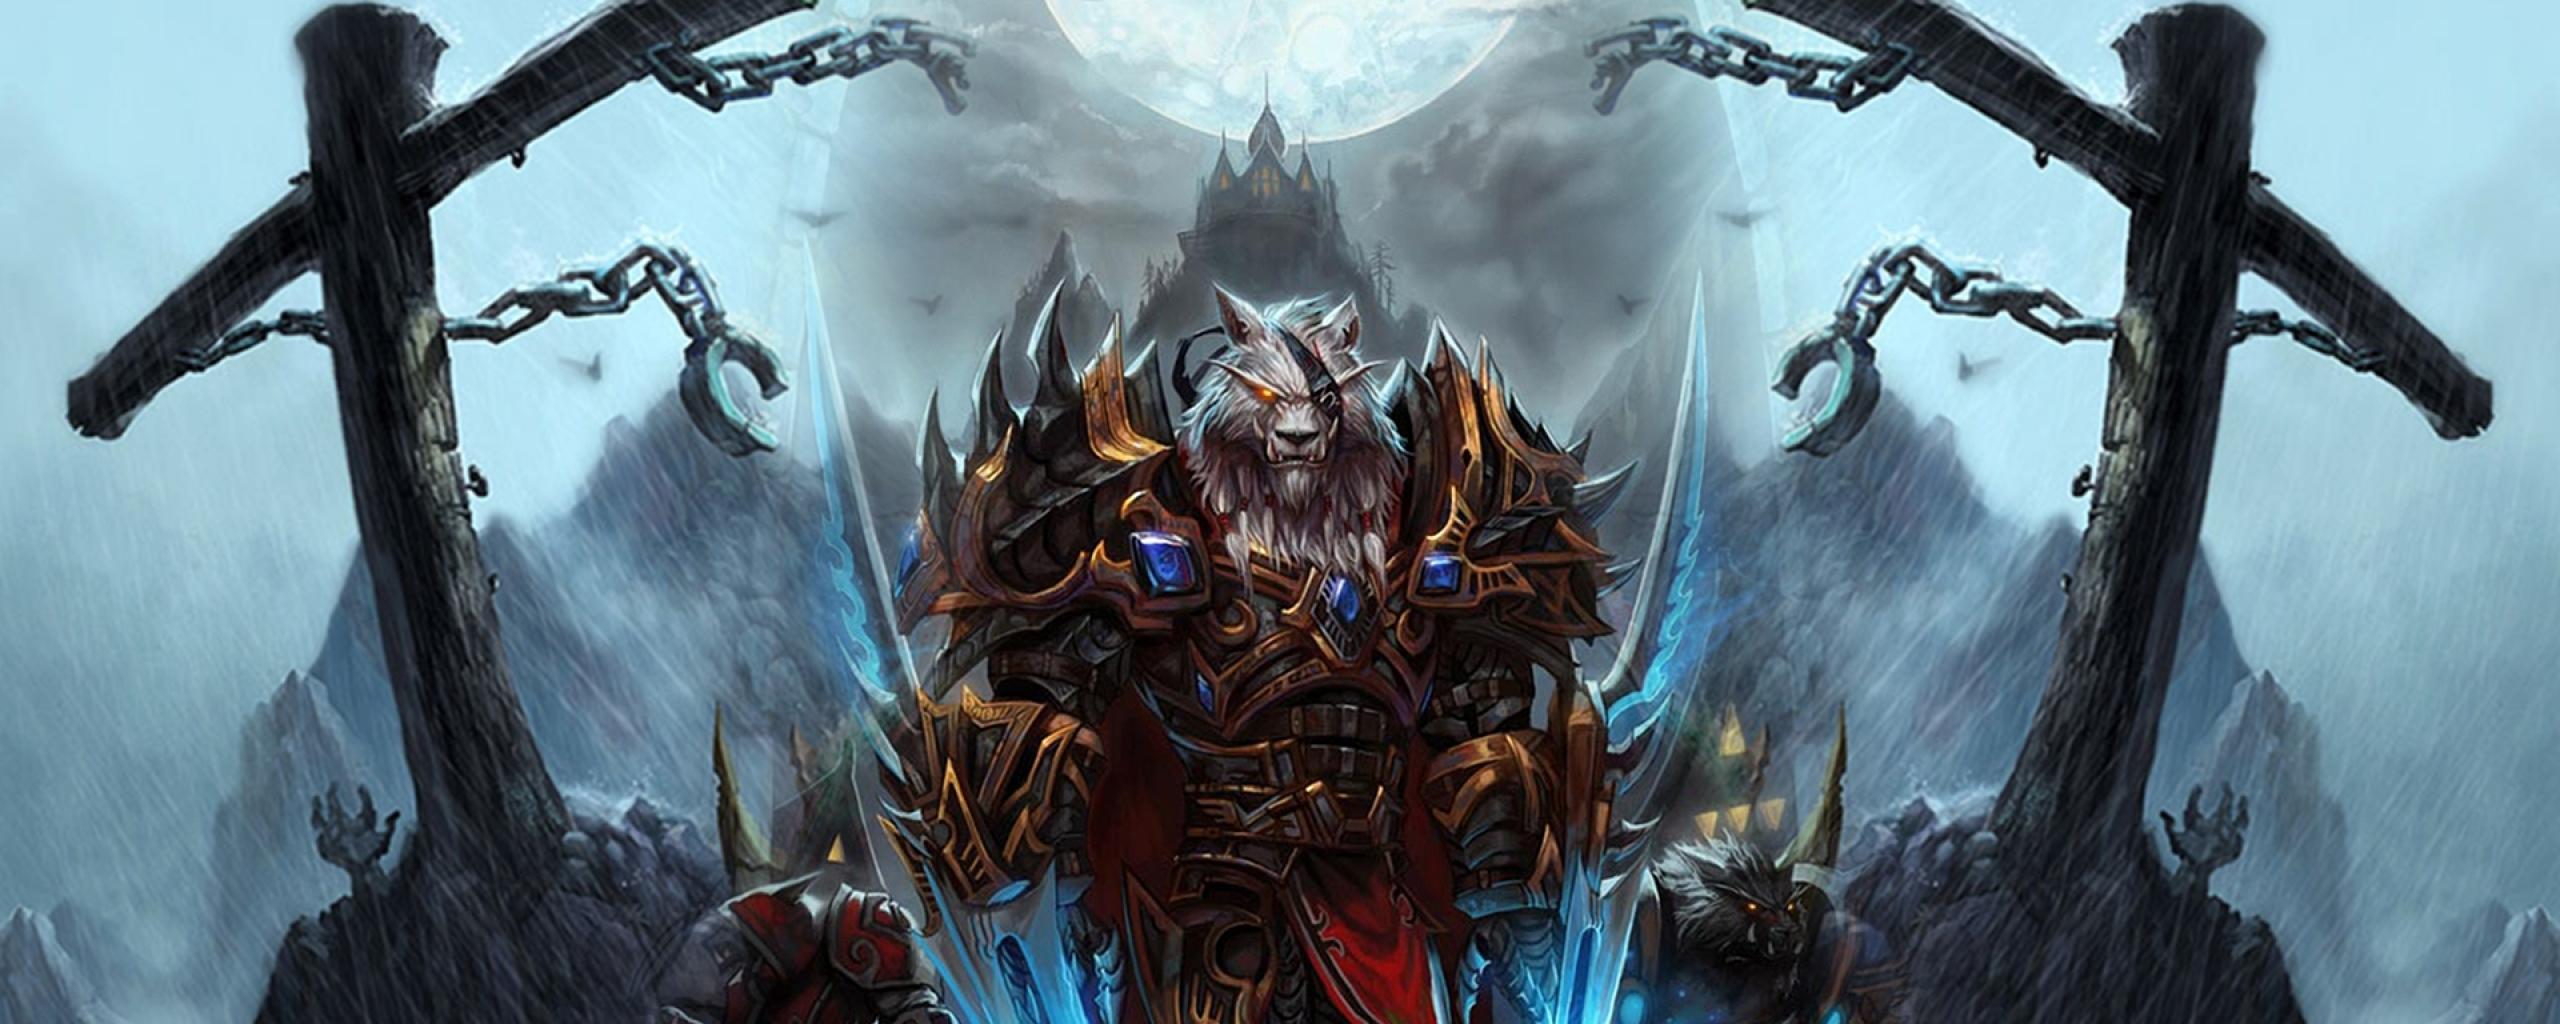 Download Wallpaper 2560x1024 World of warcraft, Worgen, Character